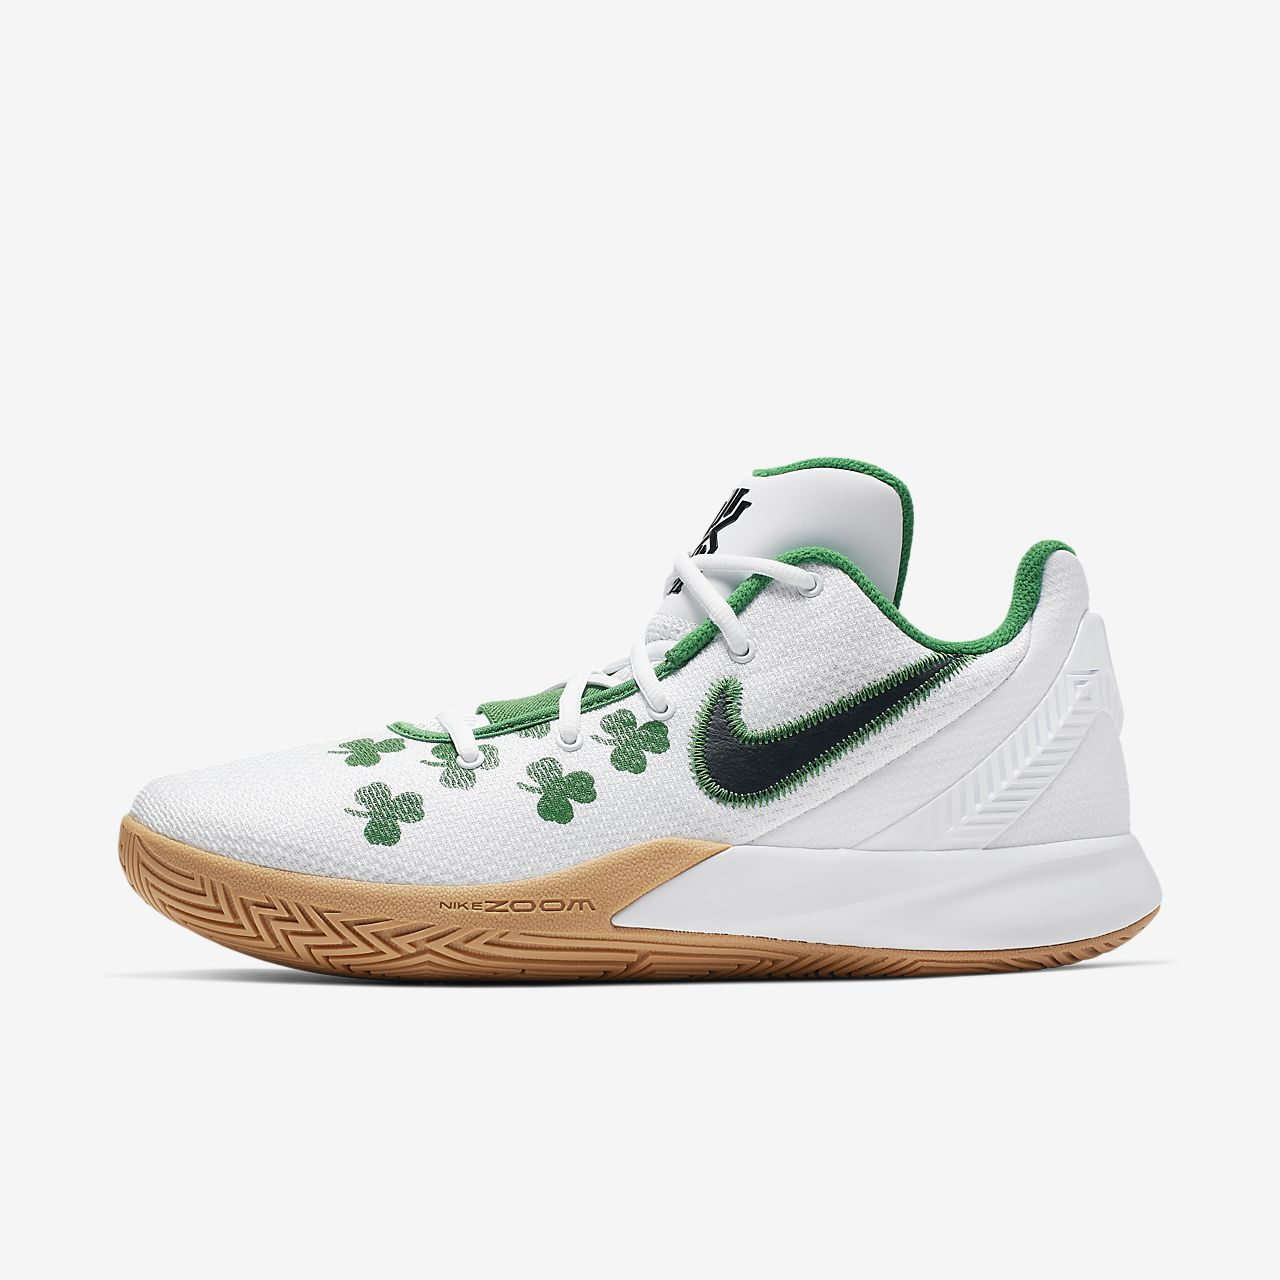 best sneakers c8a5a 2d1aa ... Kyrie Flytrap II EP Basketball Shoe